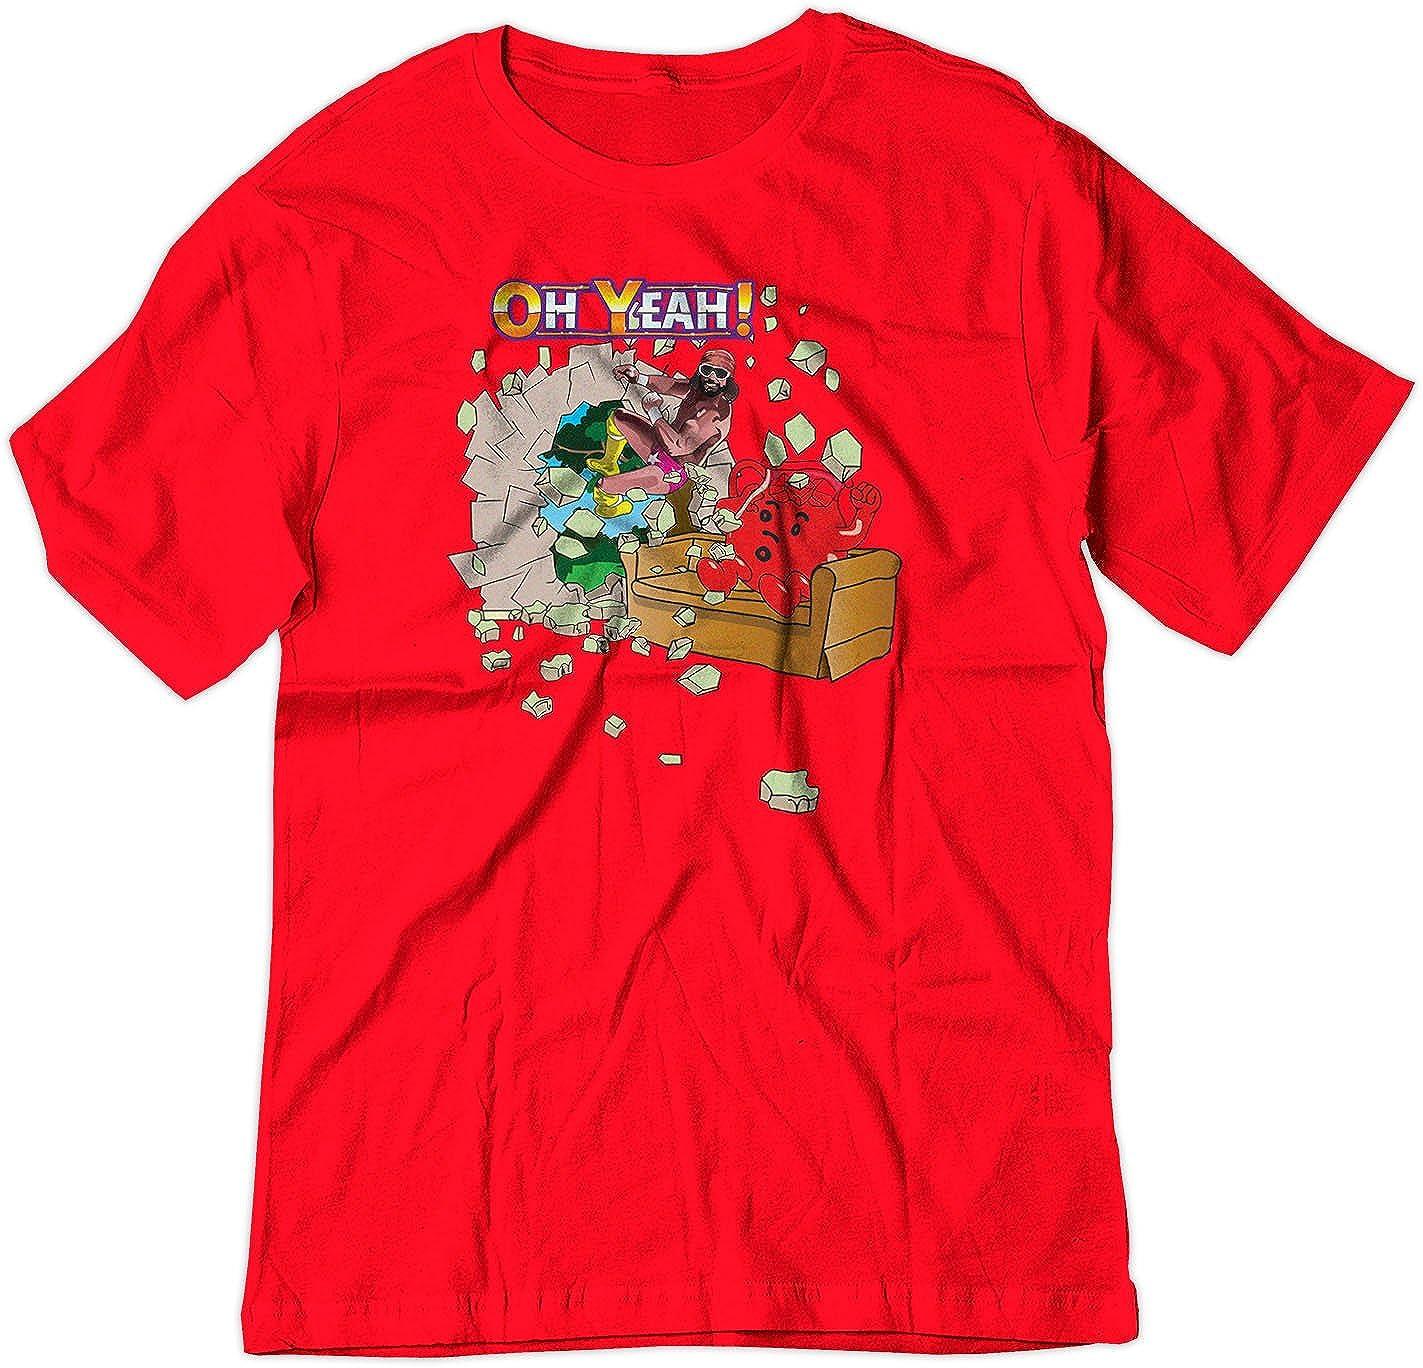 a0108eb11 Nike T Shirts With Funny Sayings | Kuenzi Turf & Nursery